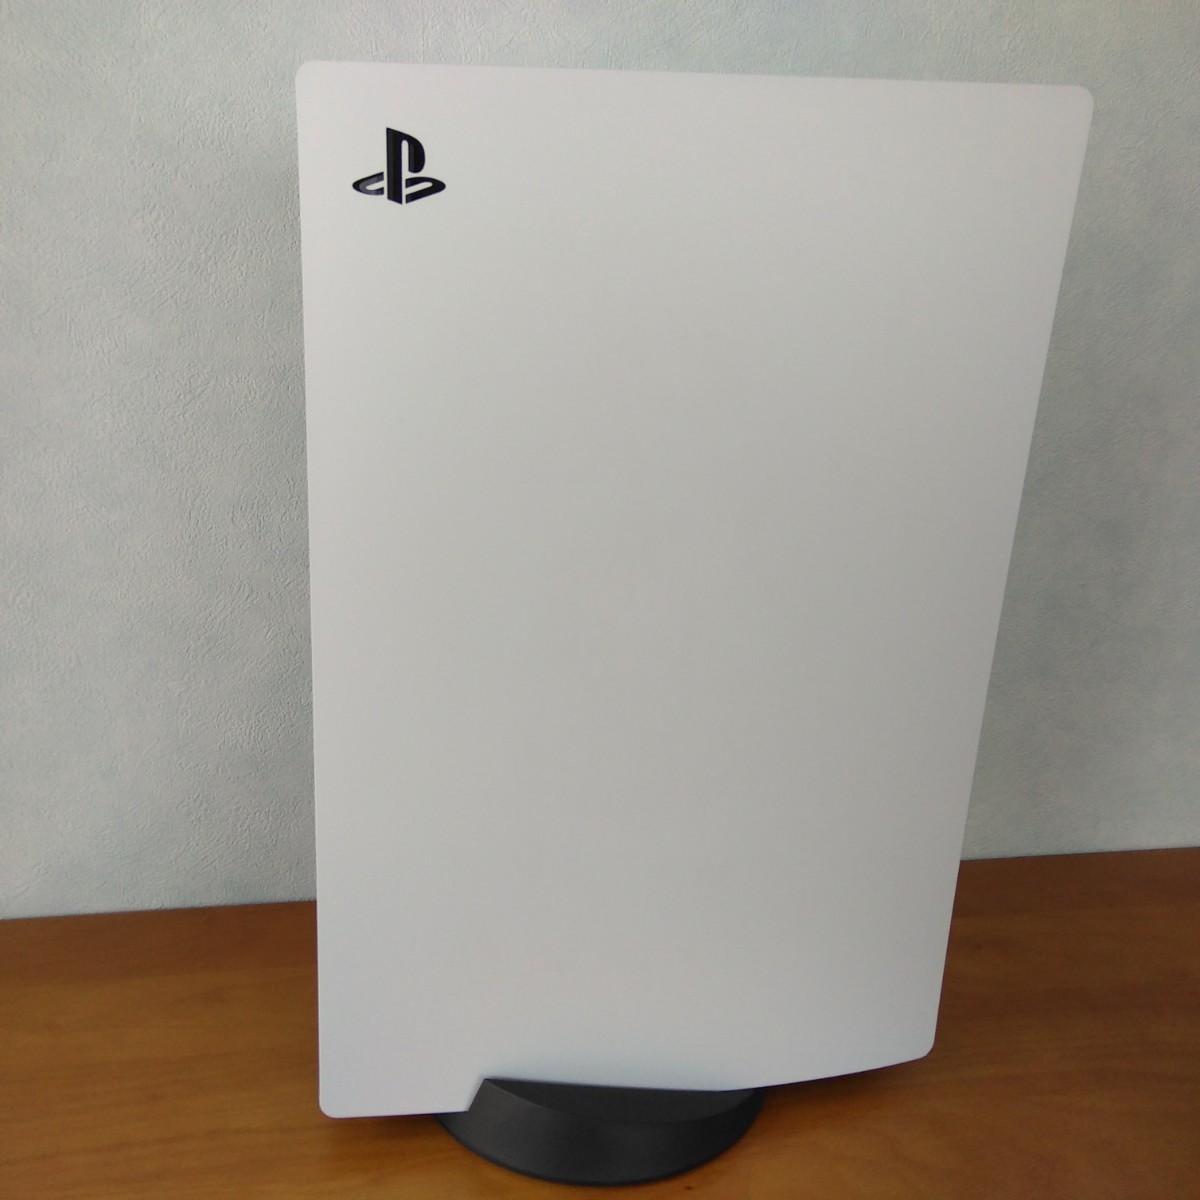 PS5 本体 プレイステーション5 ディスクドライブ版